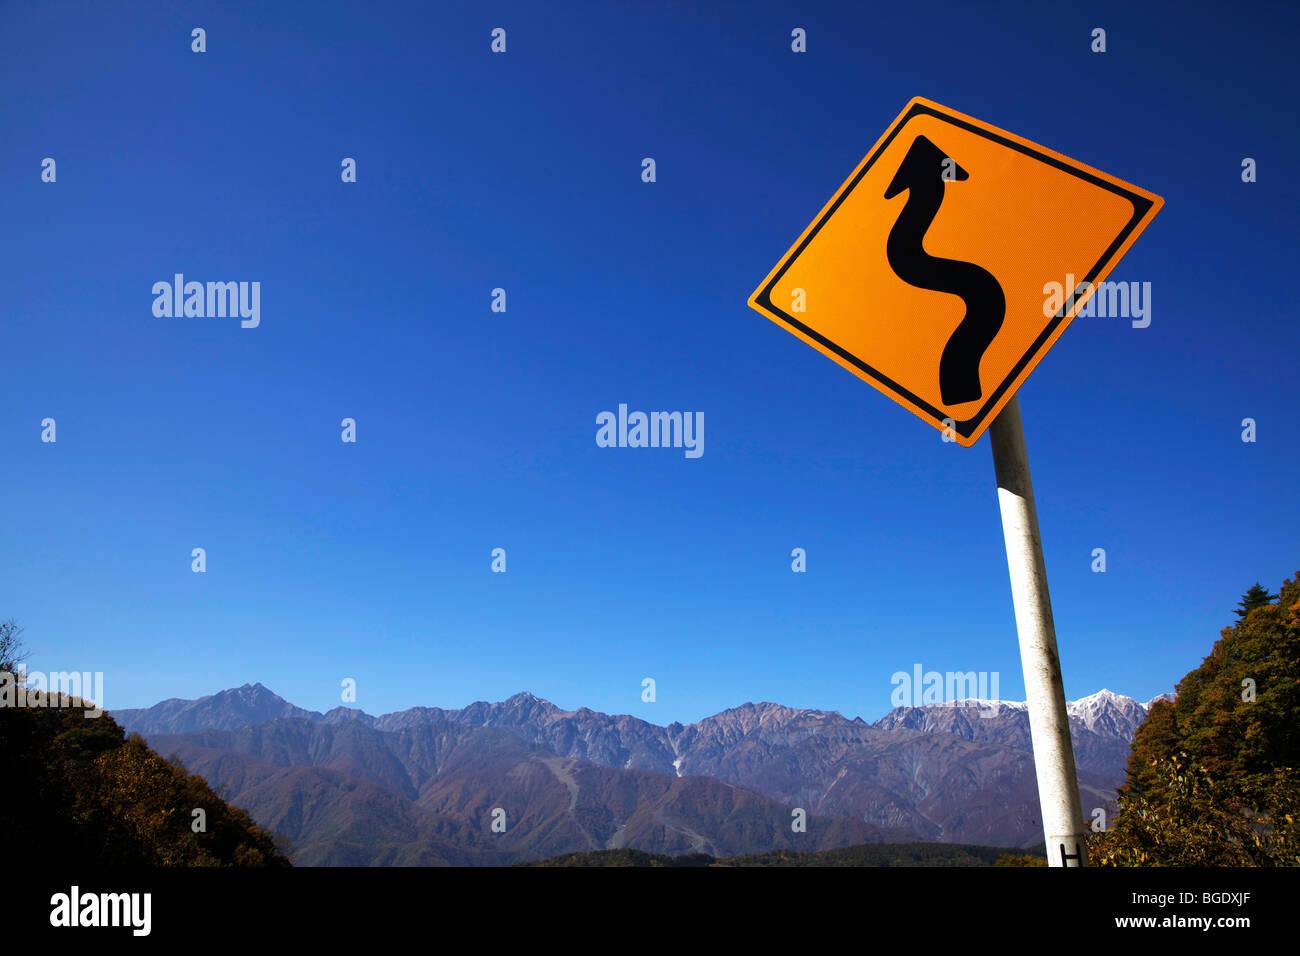 Winding road sign, near Hakuba, Nagano Prefecture, Japan - Stock Image